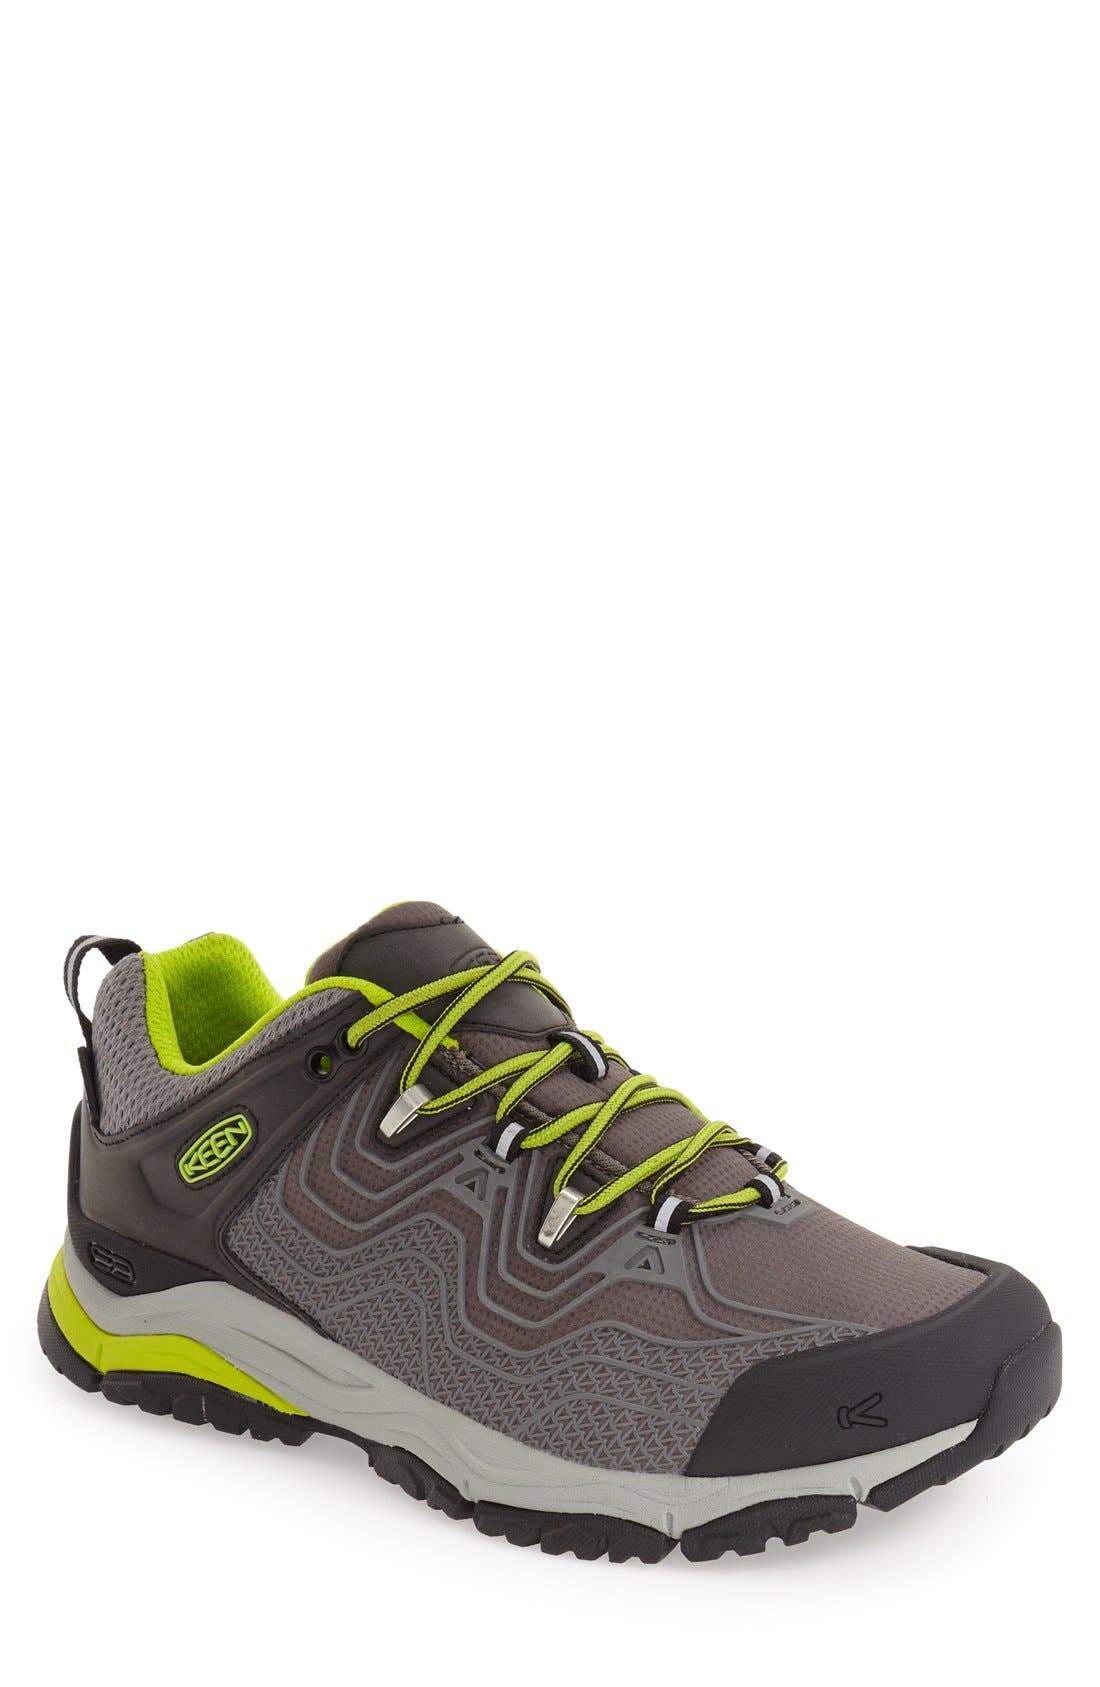 Main Image - Keen 'Aphlex' Waterproof Low Profile Hiking Shoe (Men)